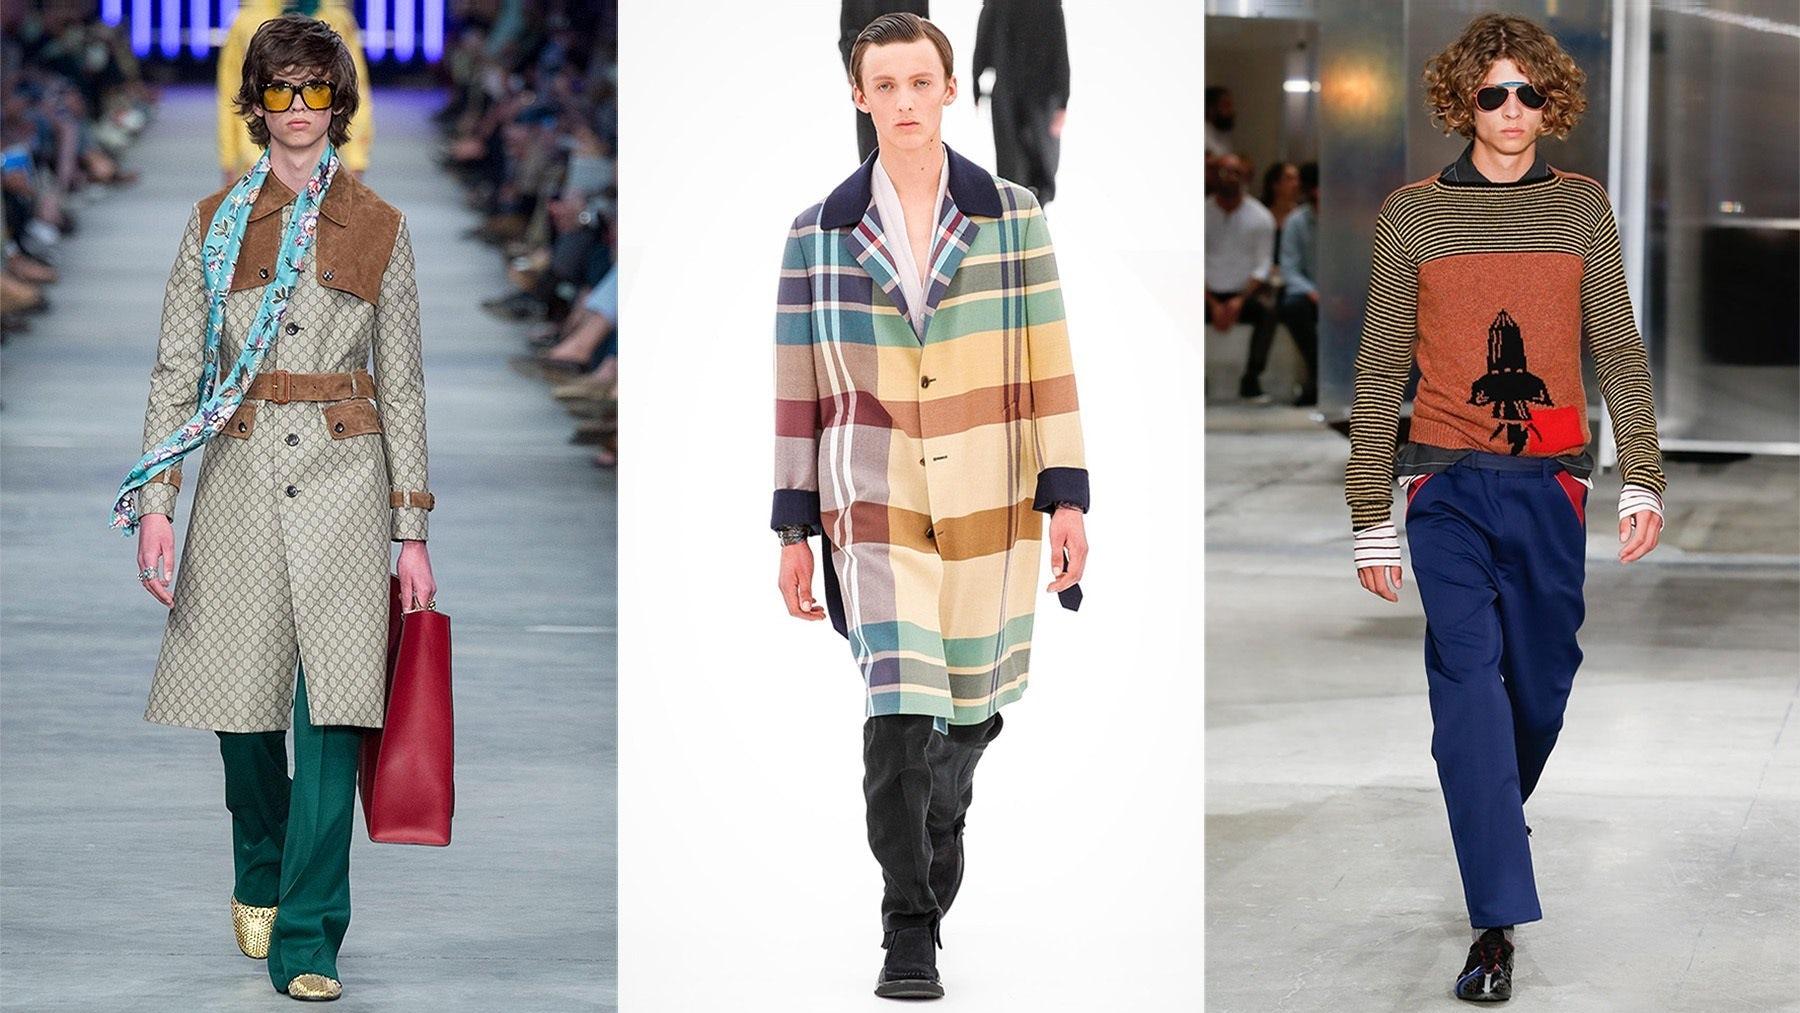 From left: Gucci, Ermenegildo Zegna, Prada Spring/Summer 2016 | Source: Indigital